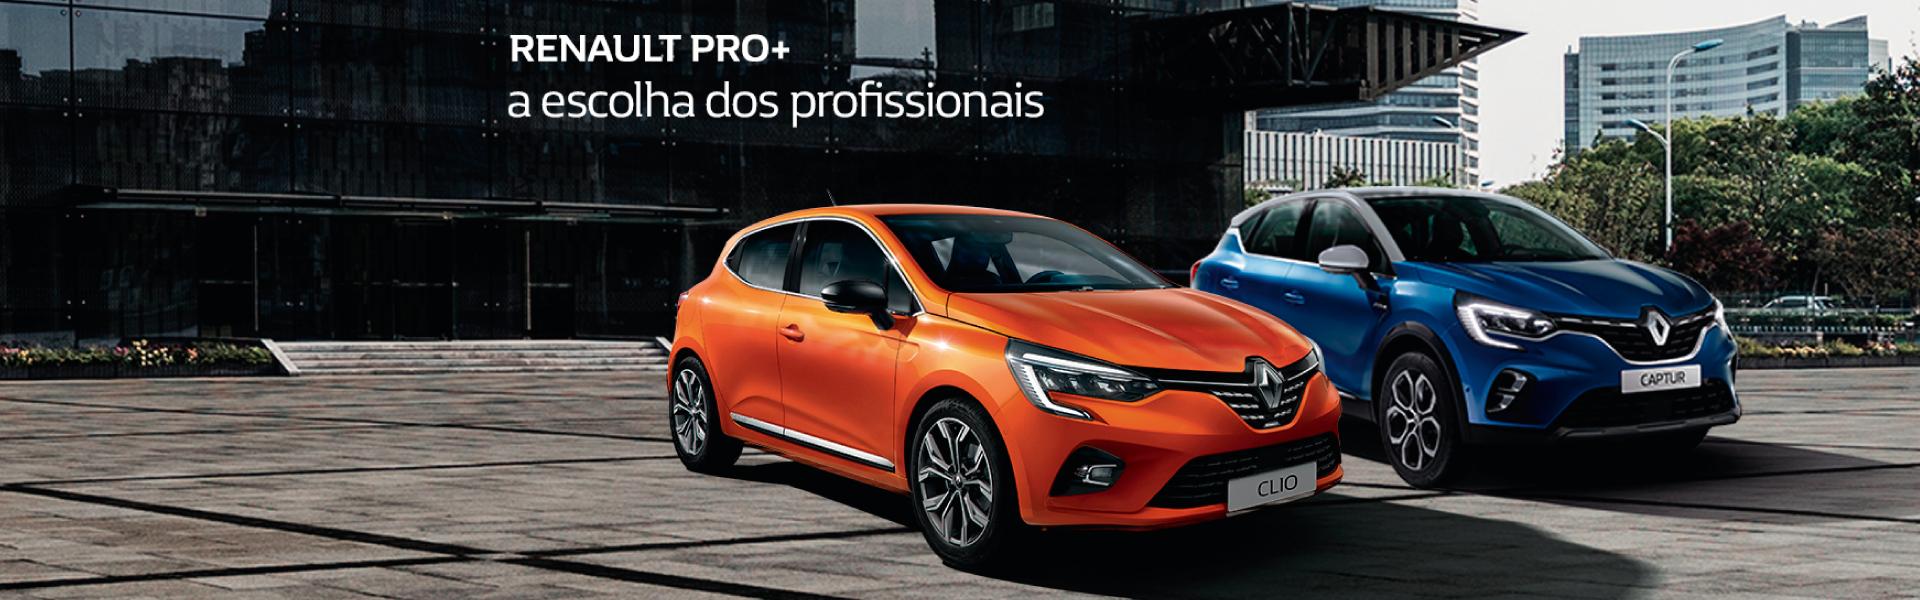 Gama Renault Pro +